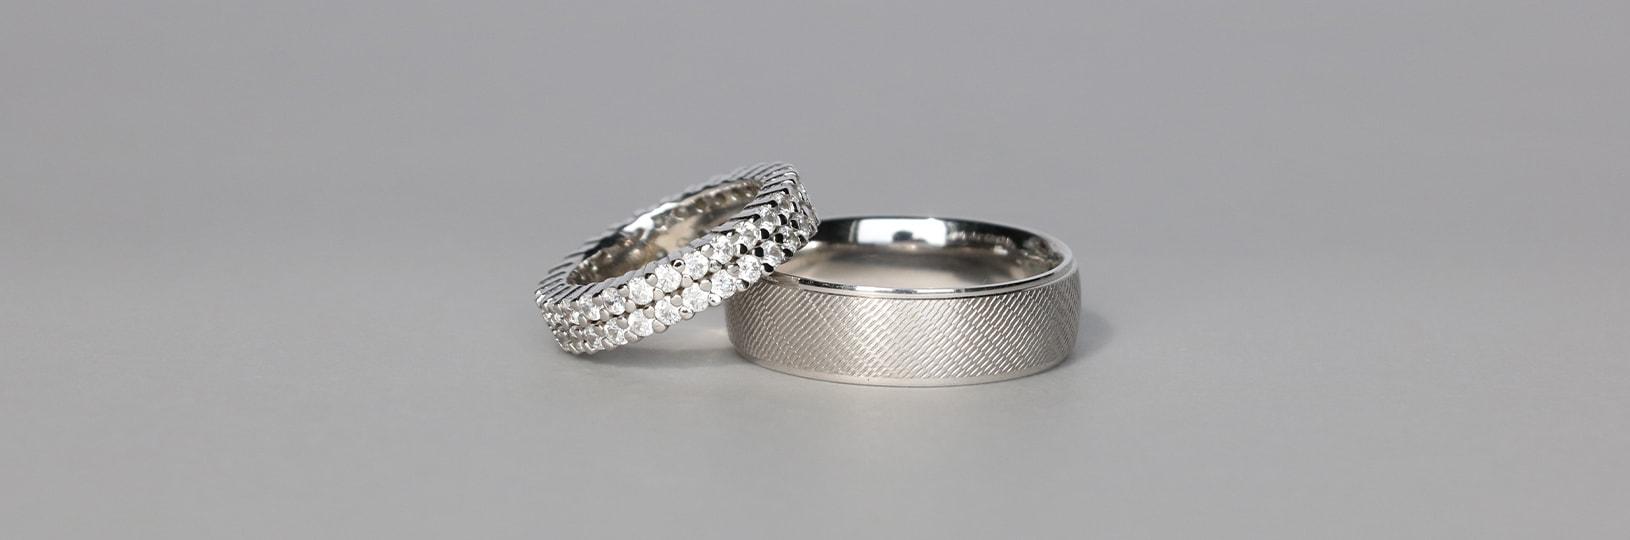 Women's eternity ring and men's classic wedding ring